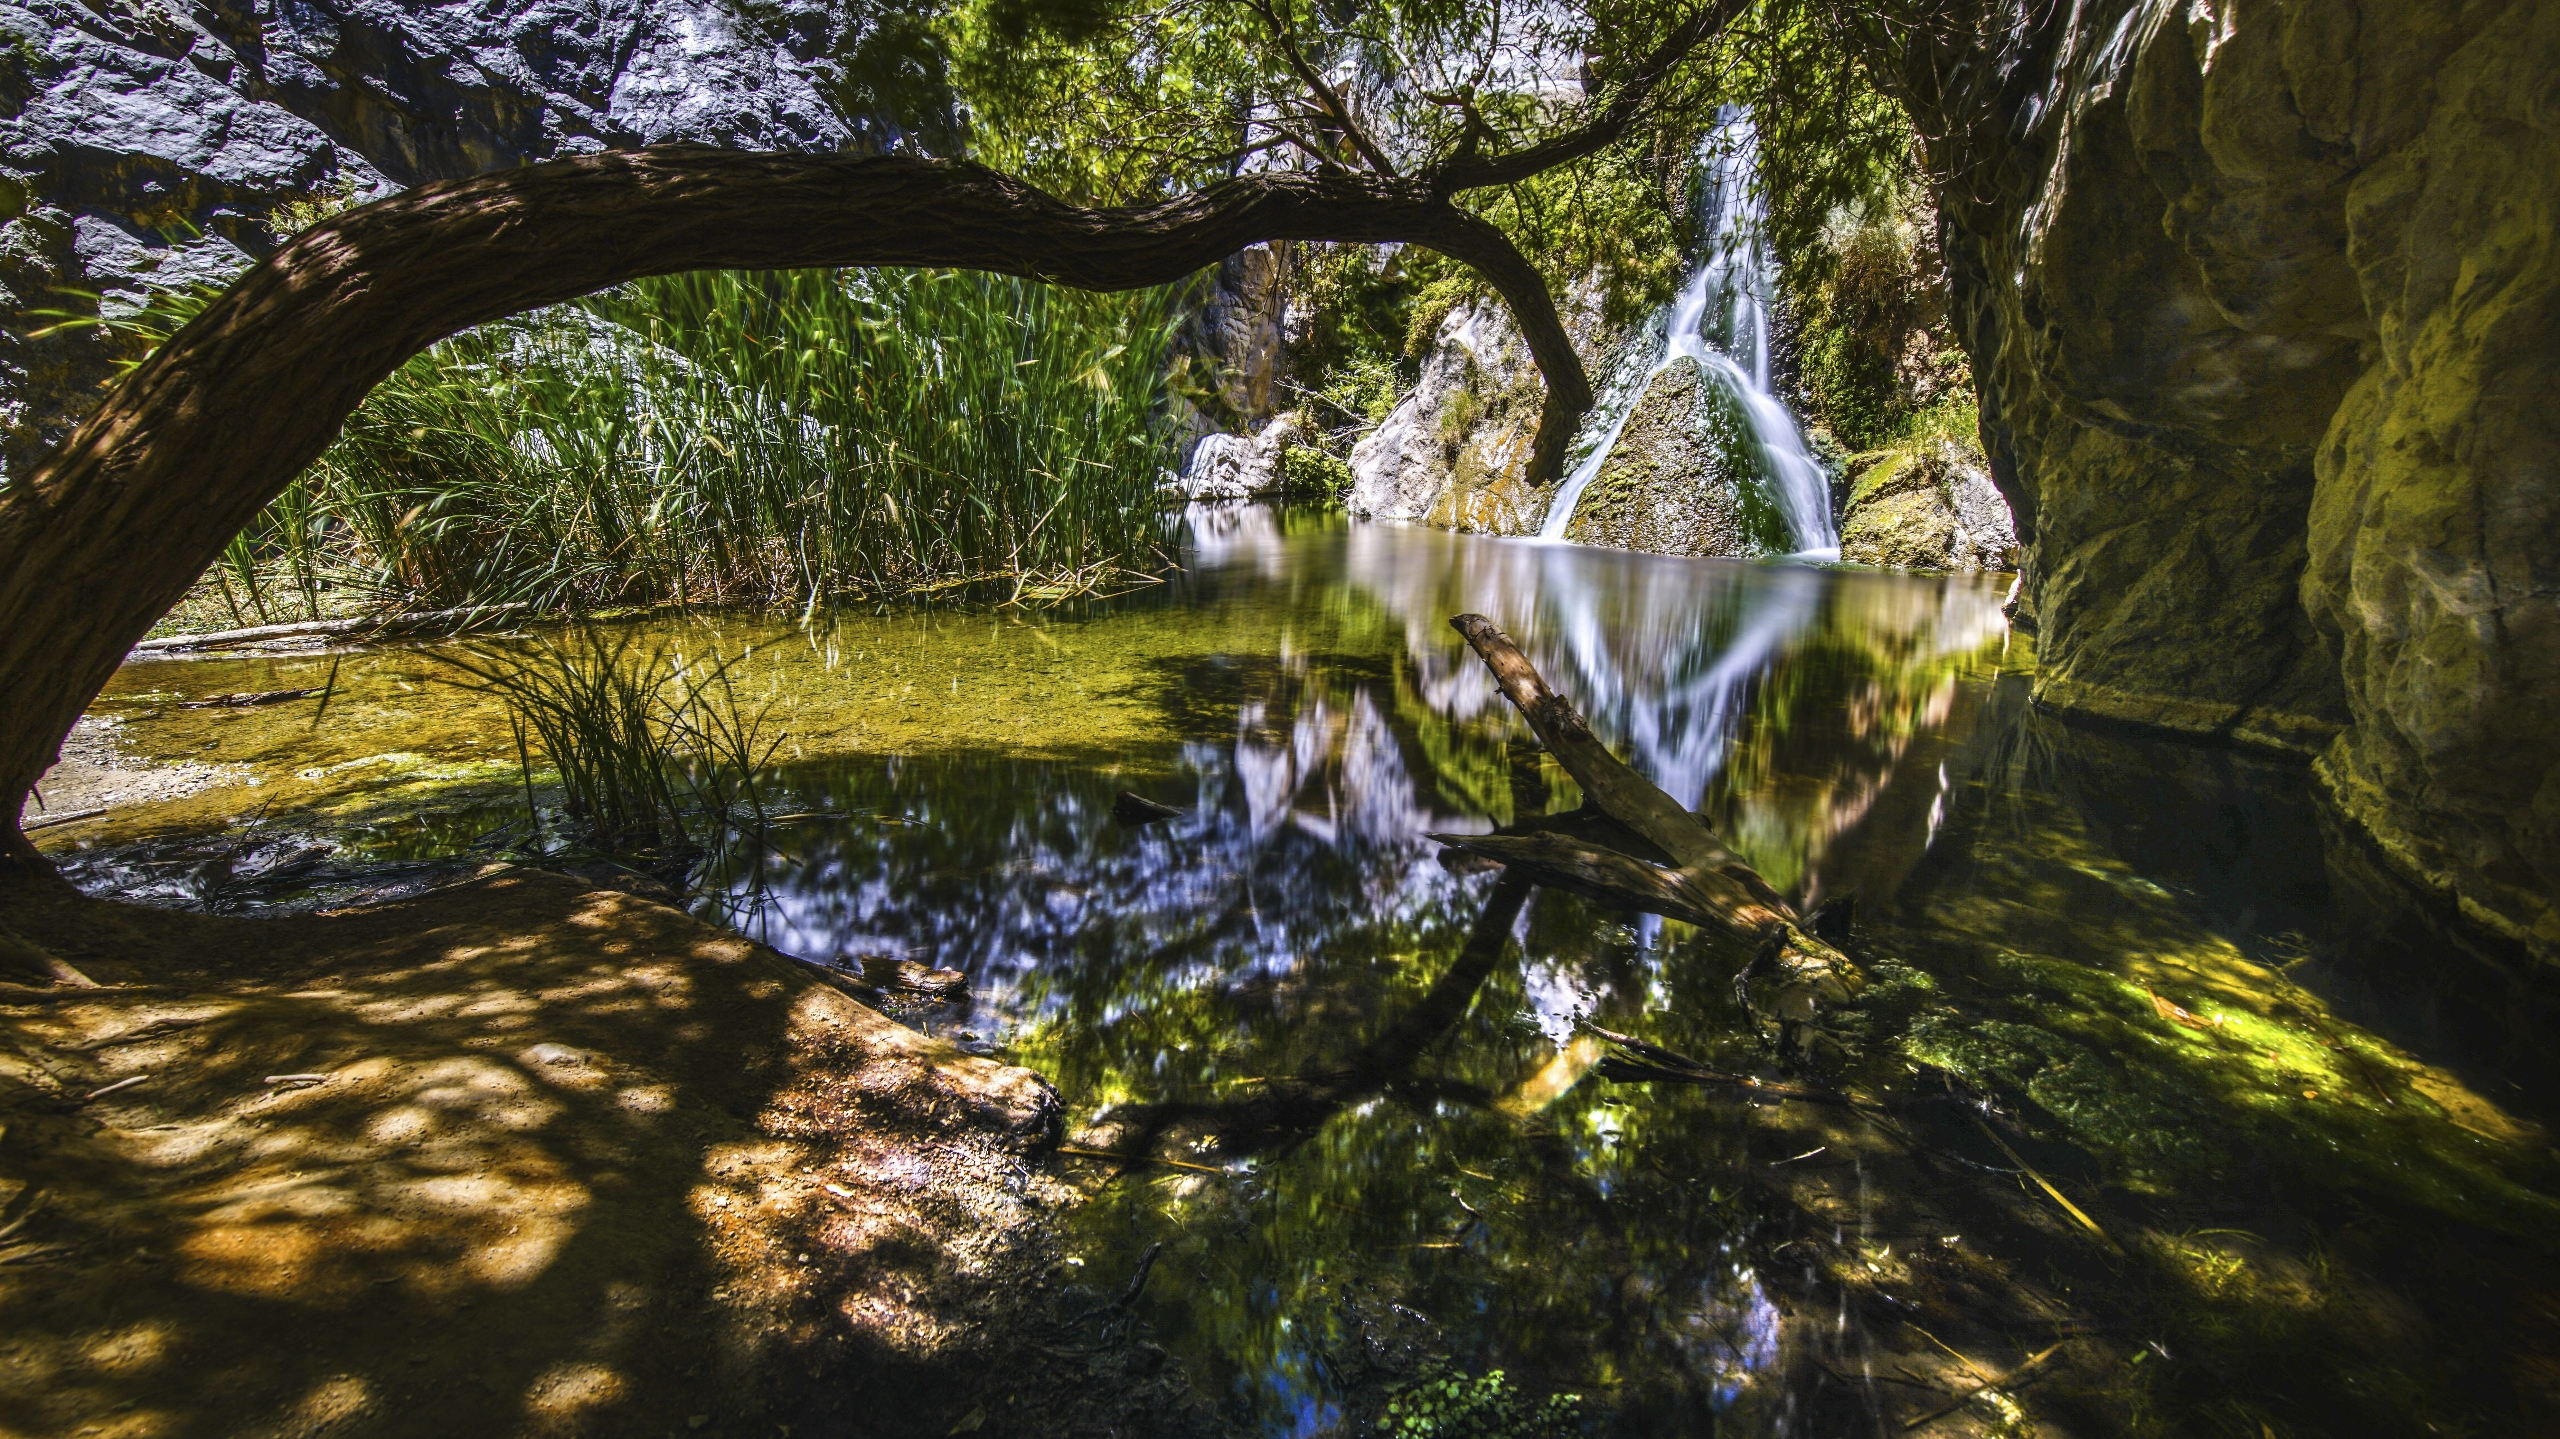 amazing oasis middle hottest pl - thatusernameistaken | ello